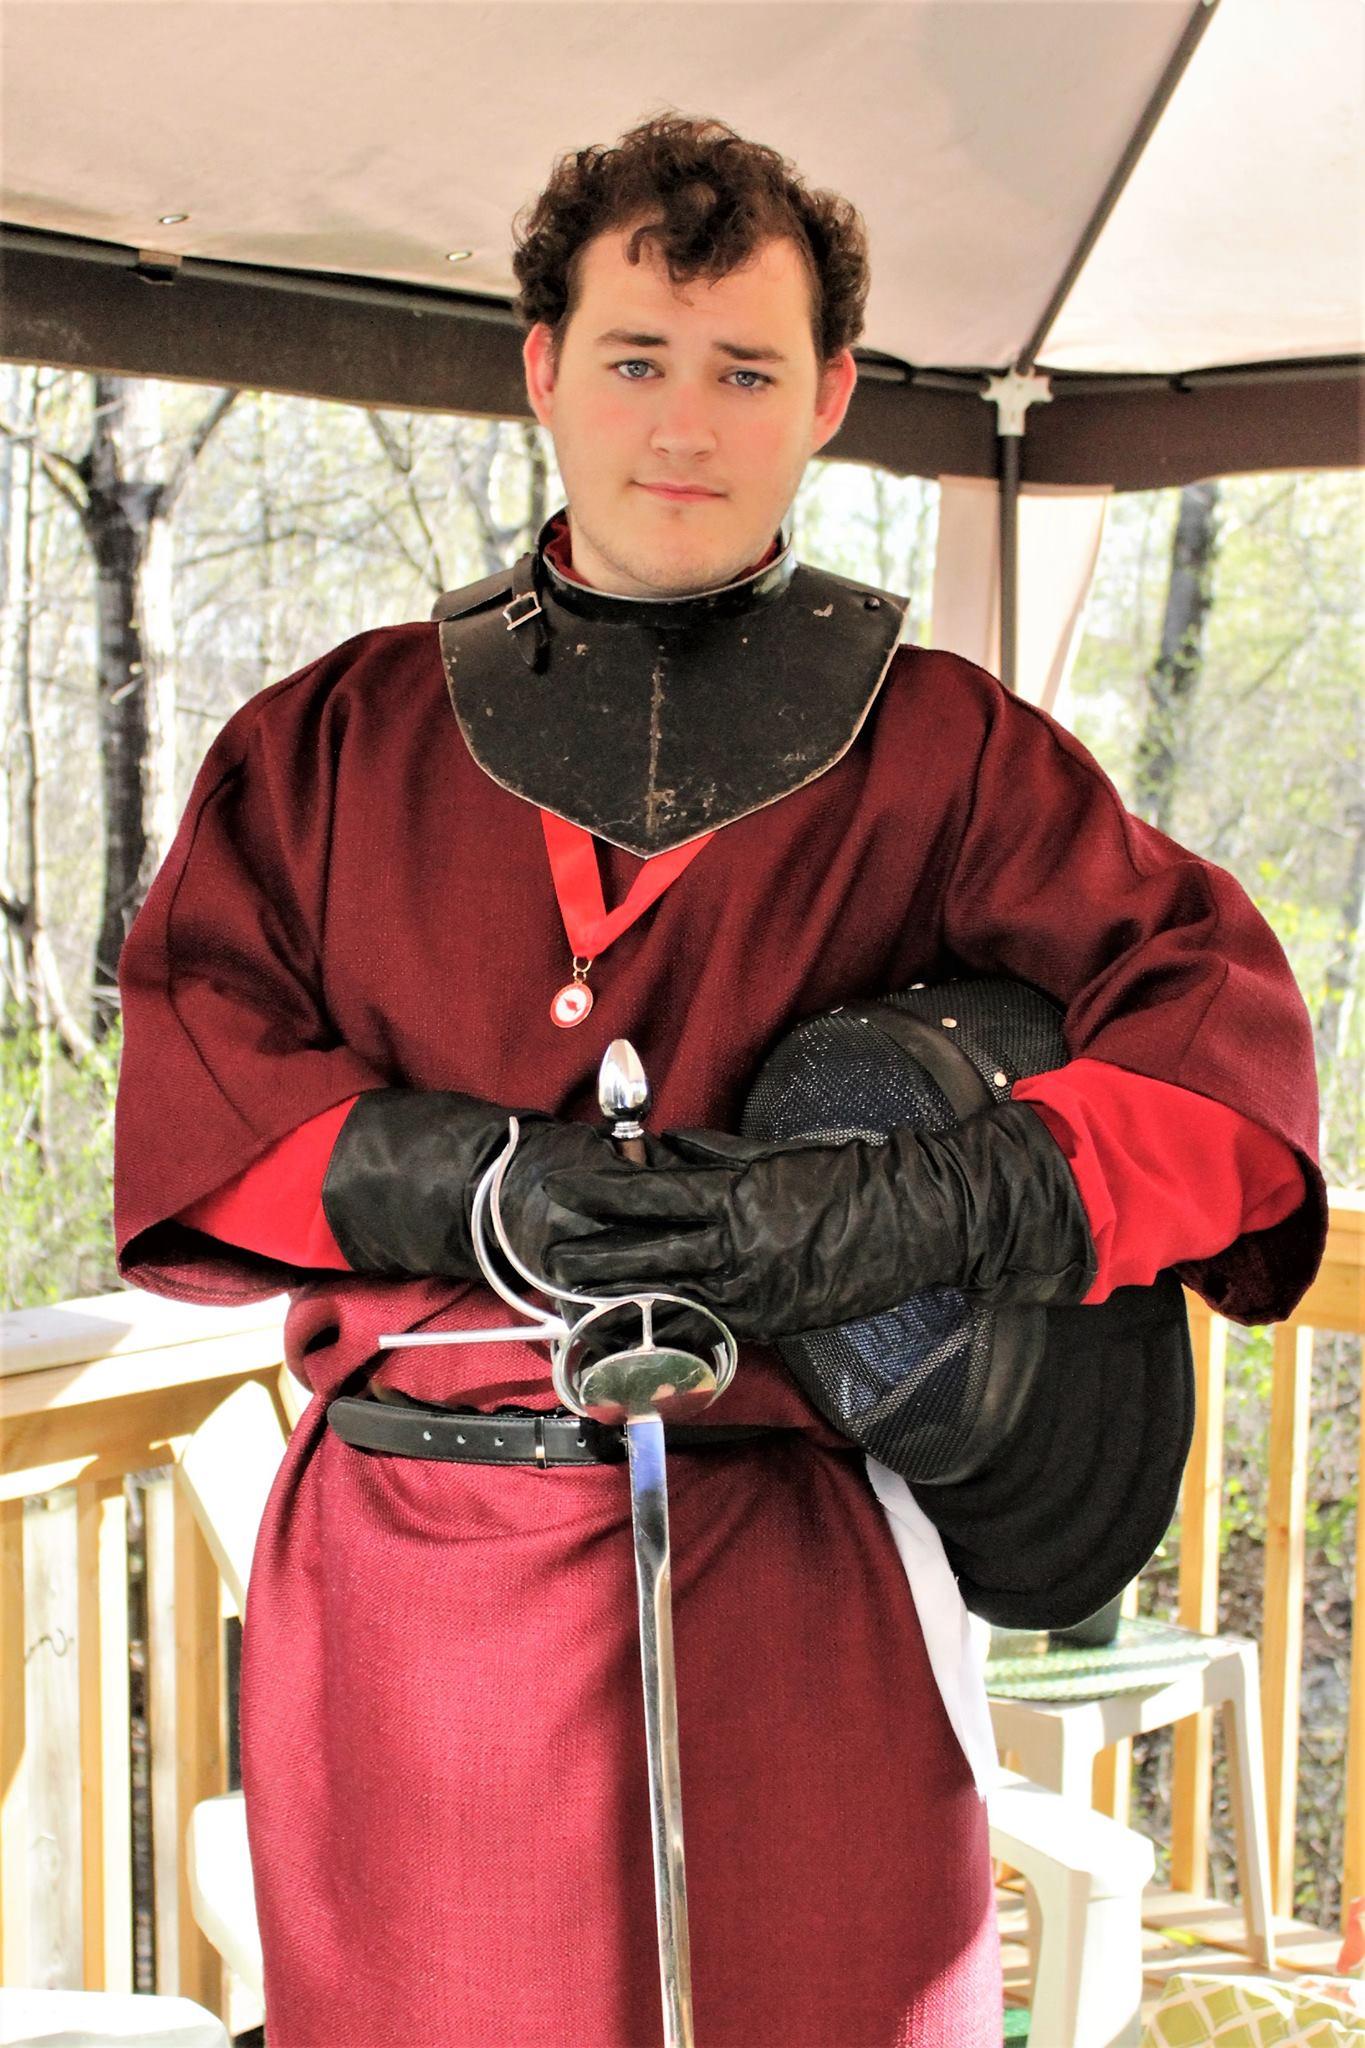 Shamus_with_sword